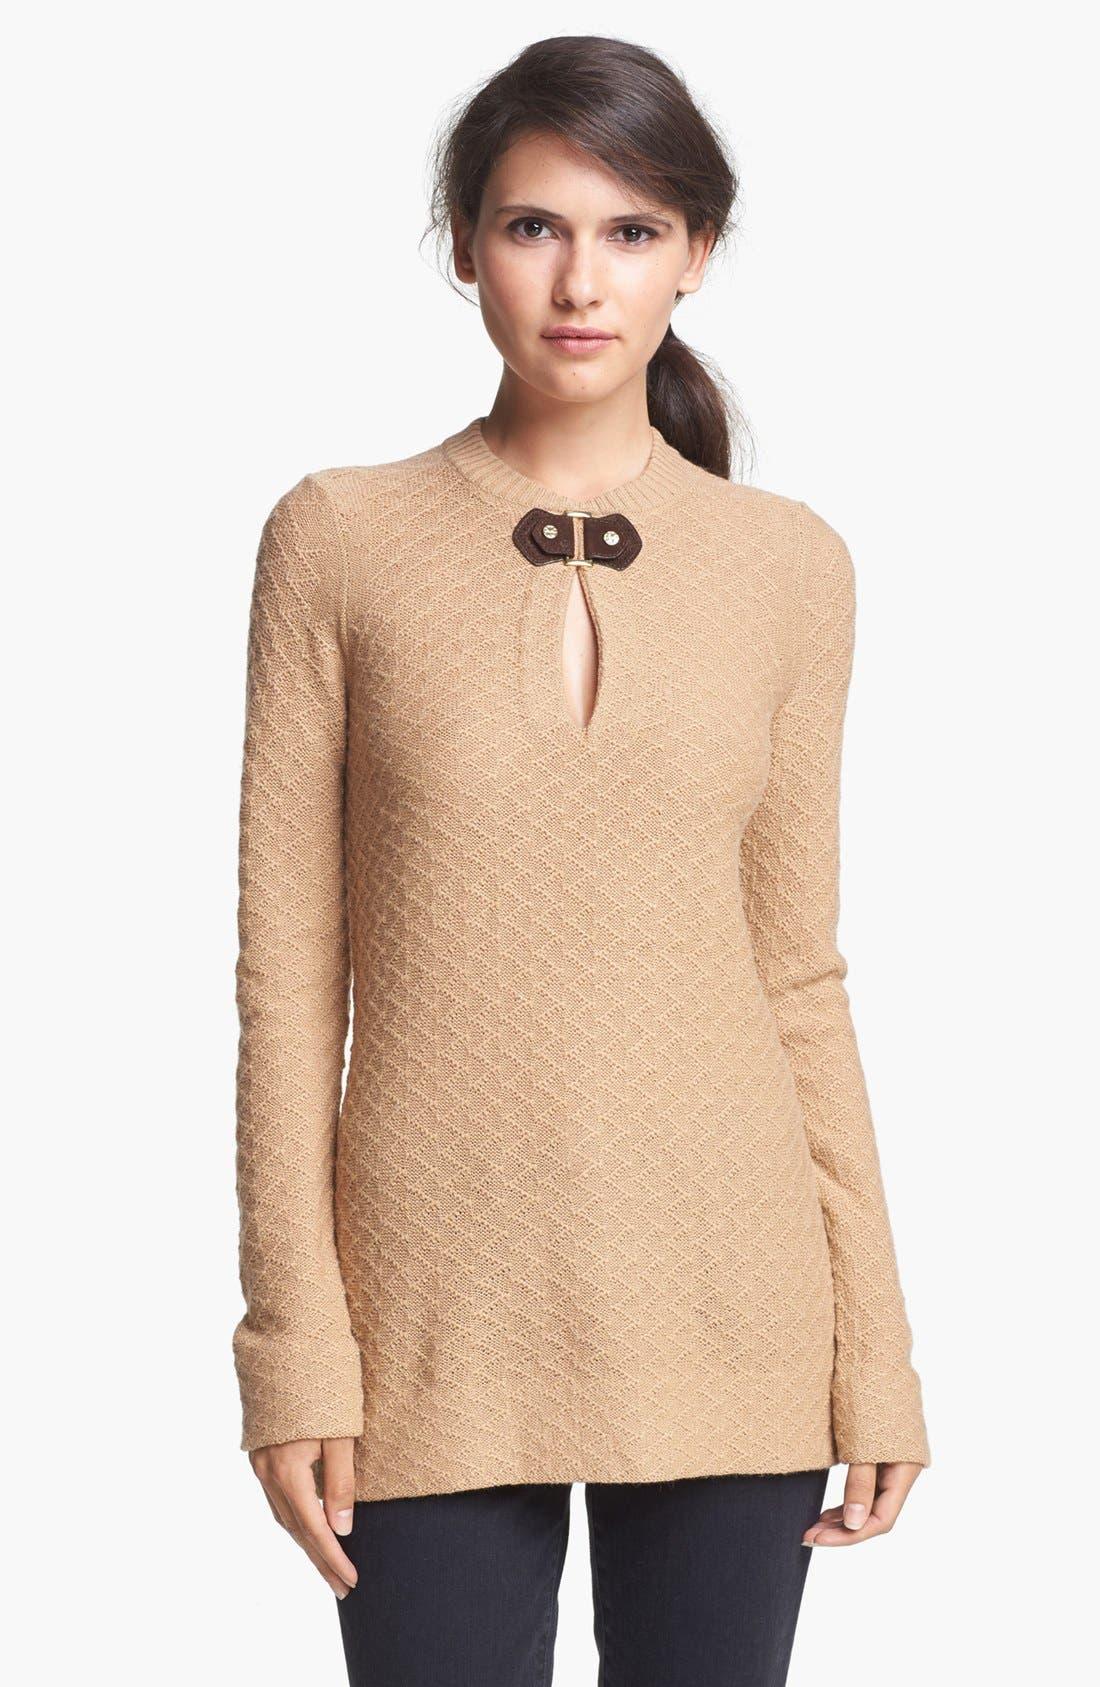 'Mim' Tunic Sweater,                             Main thumbnail 1, color,                             258